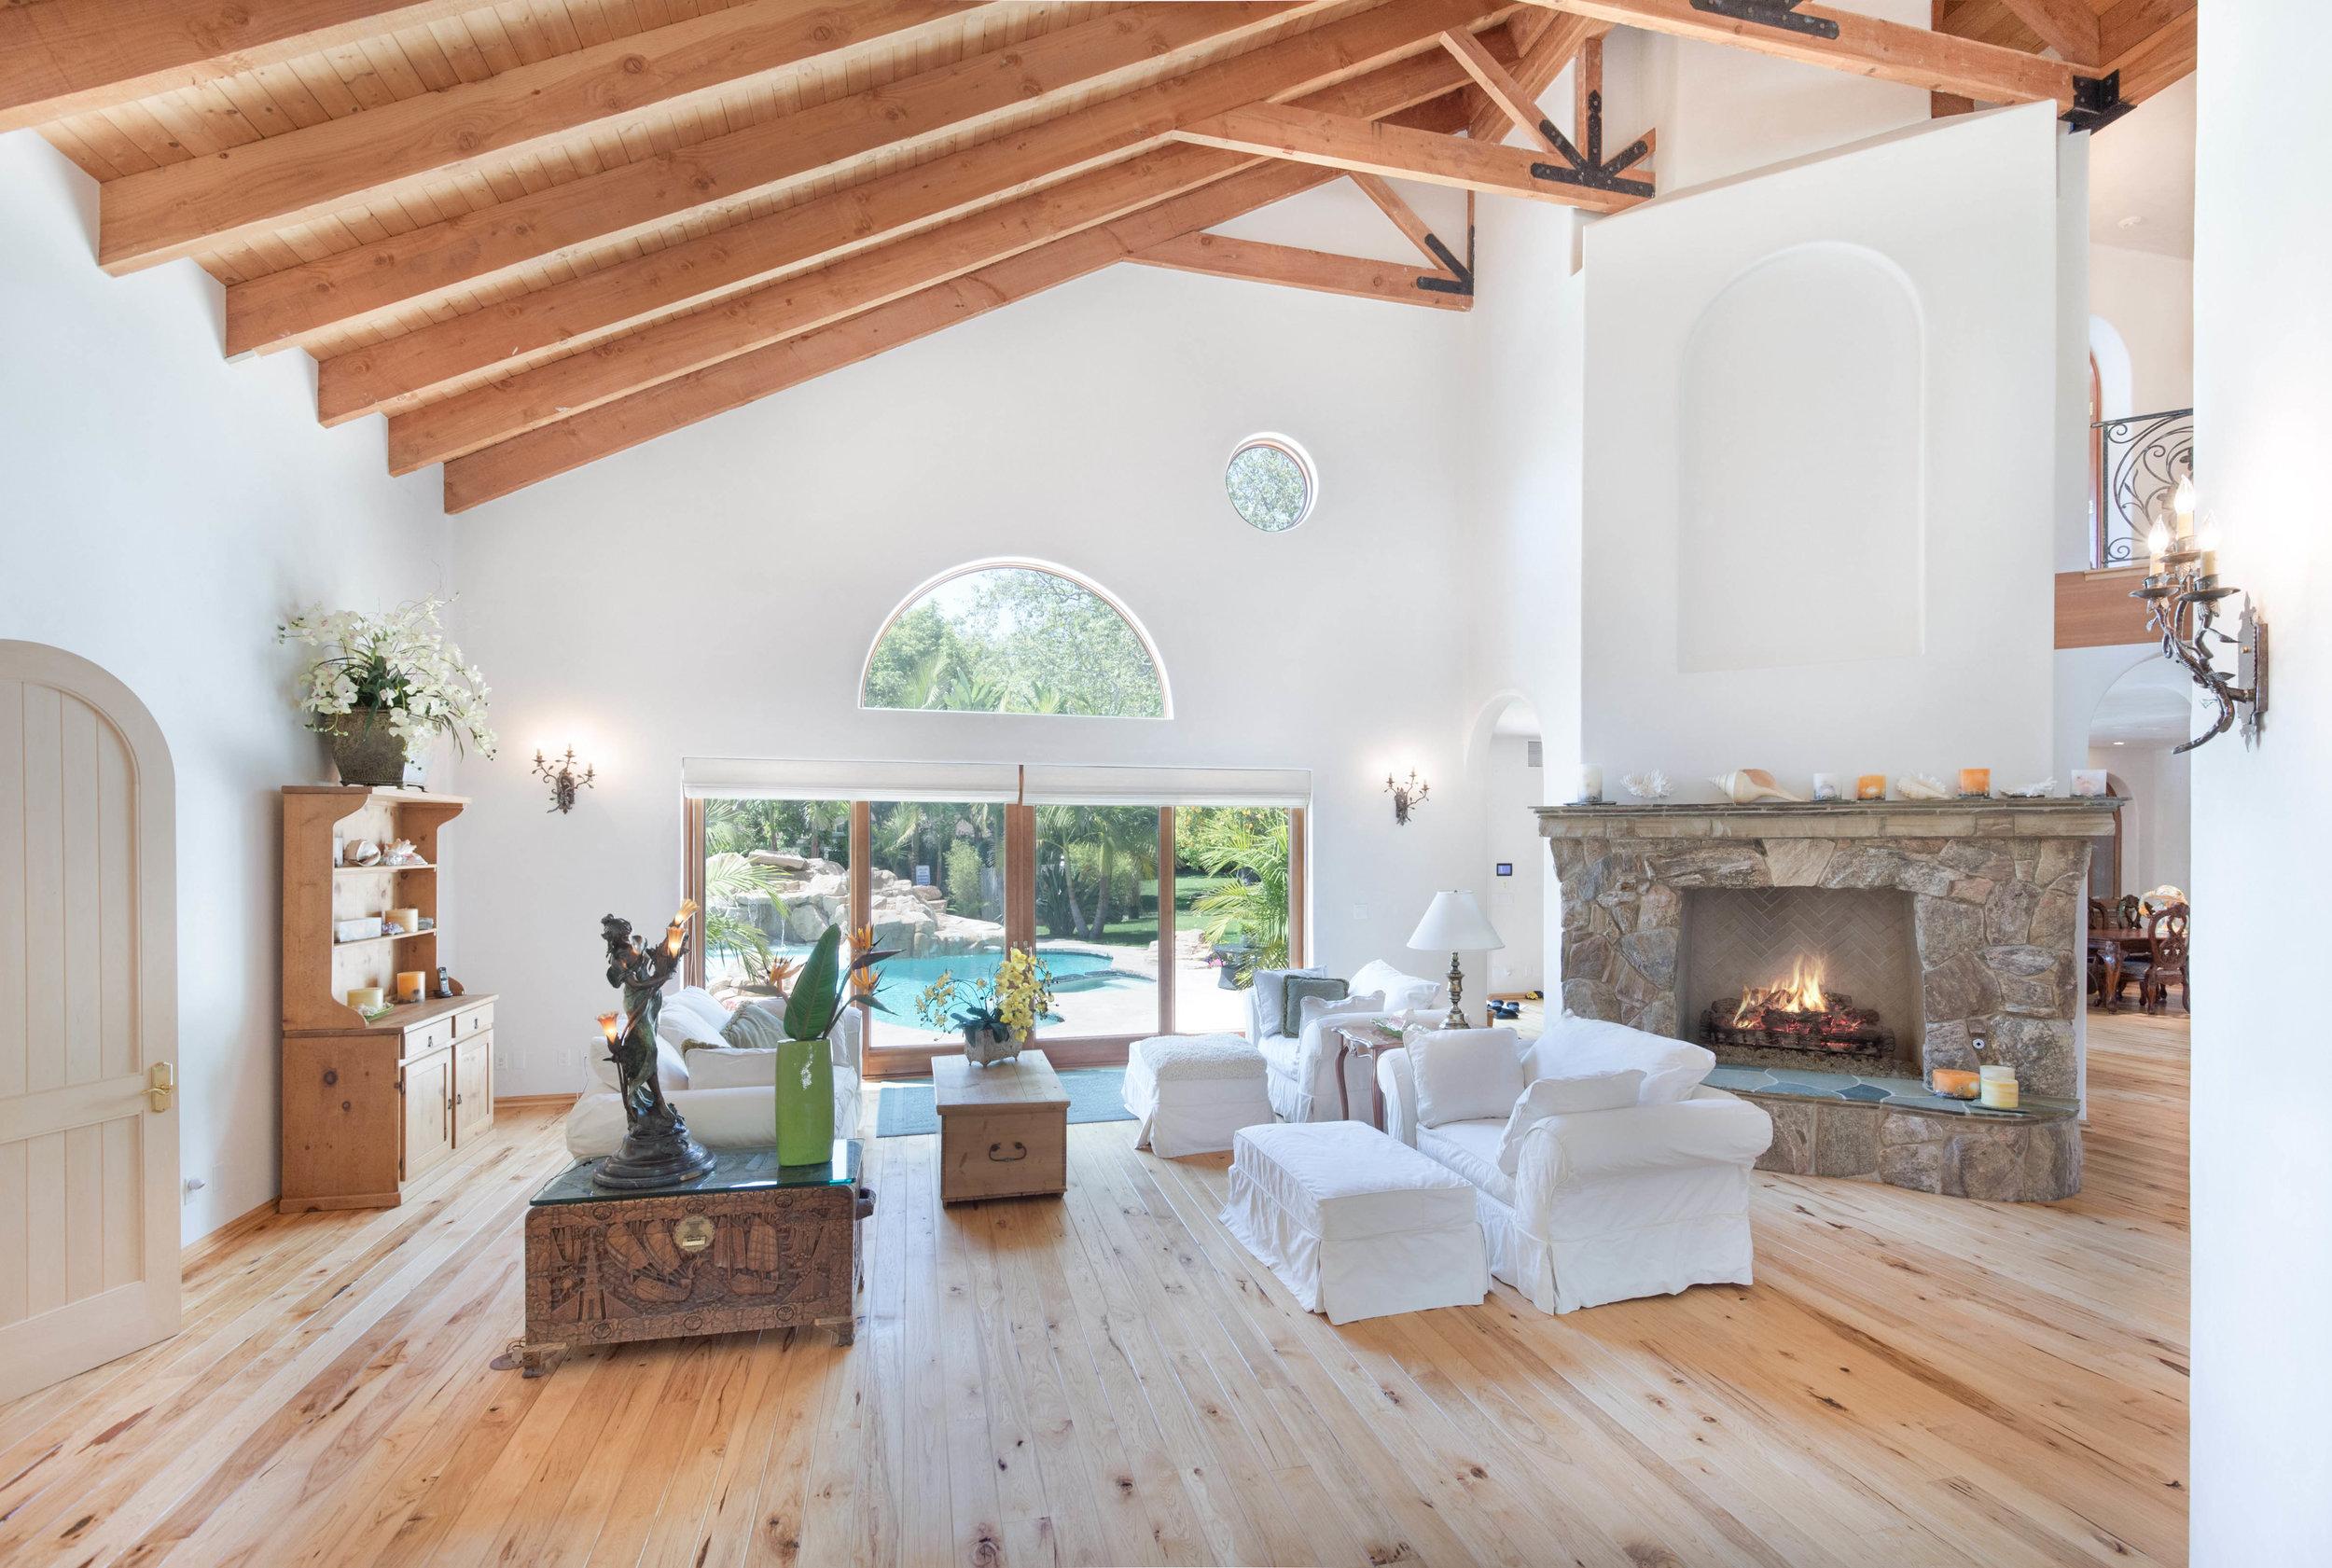 005 living room 6405 bonsall Malibu For Sale The Malibu Life Team Luxury Real Estate.jpg